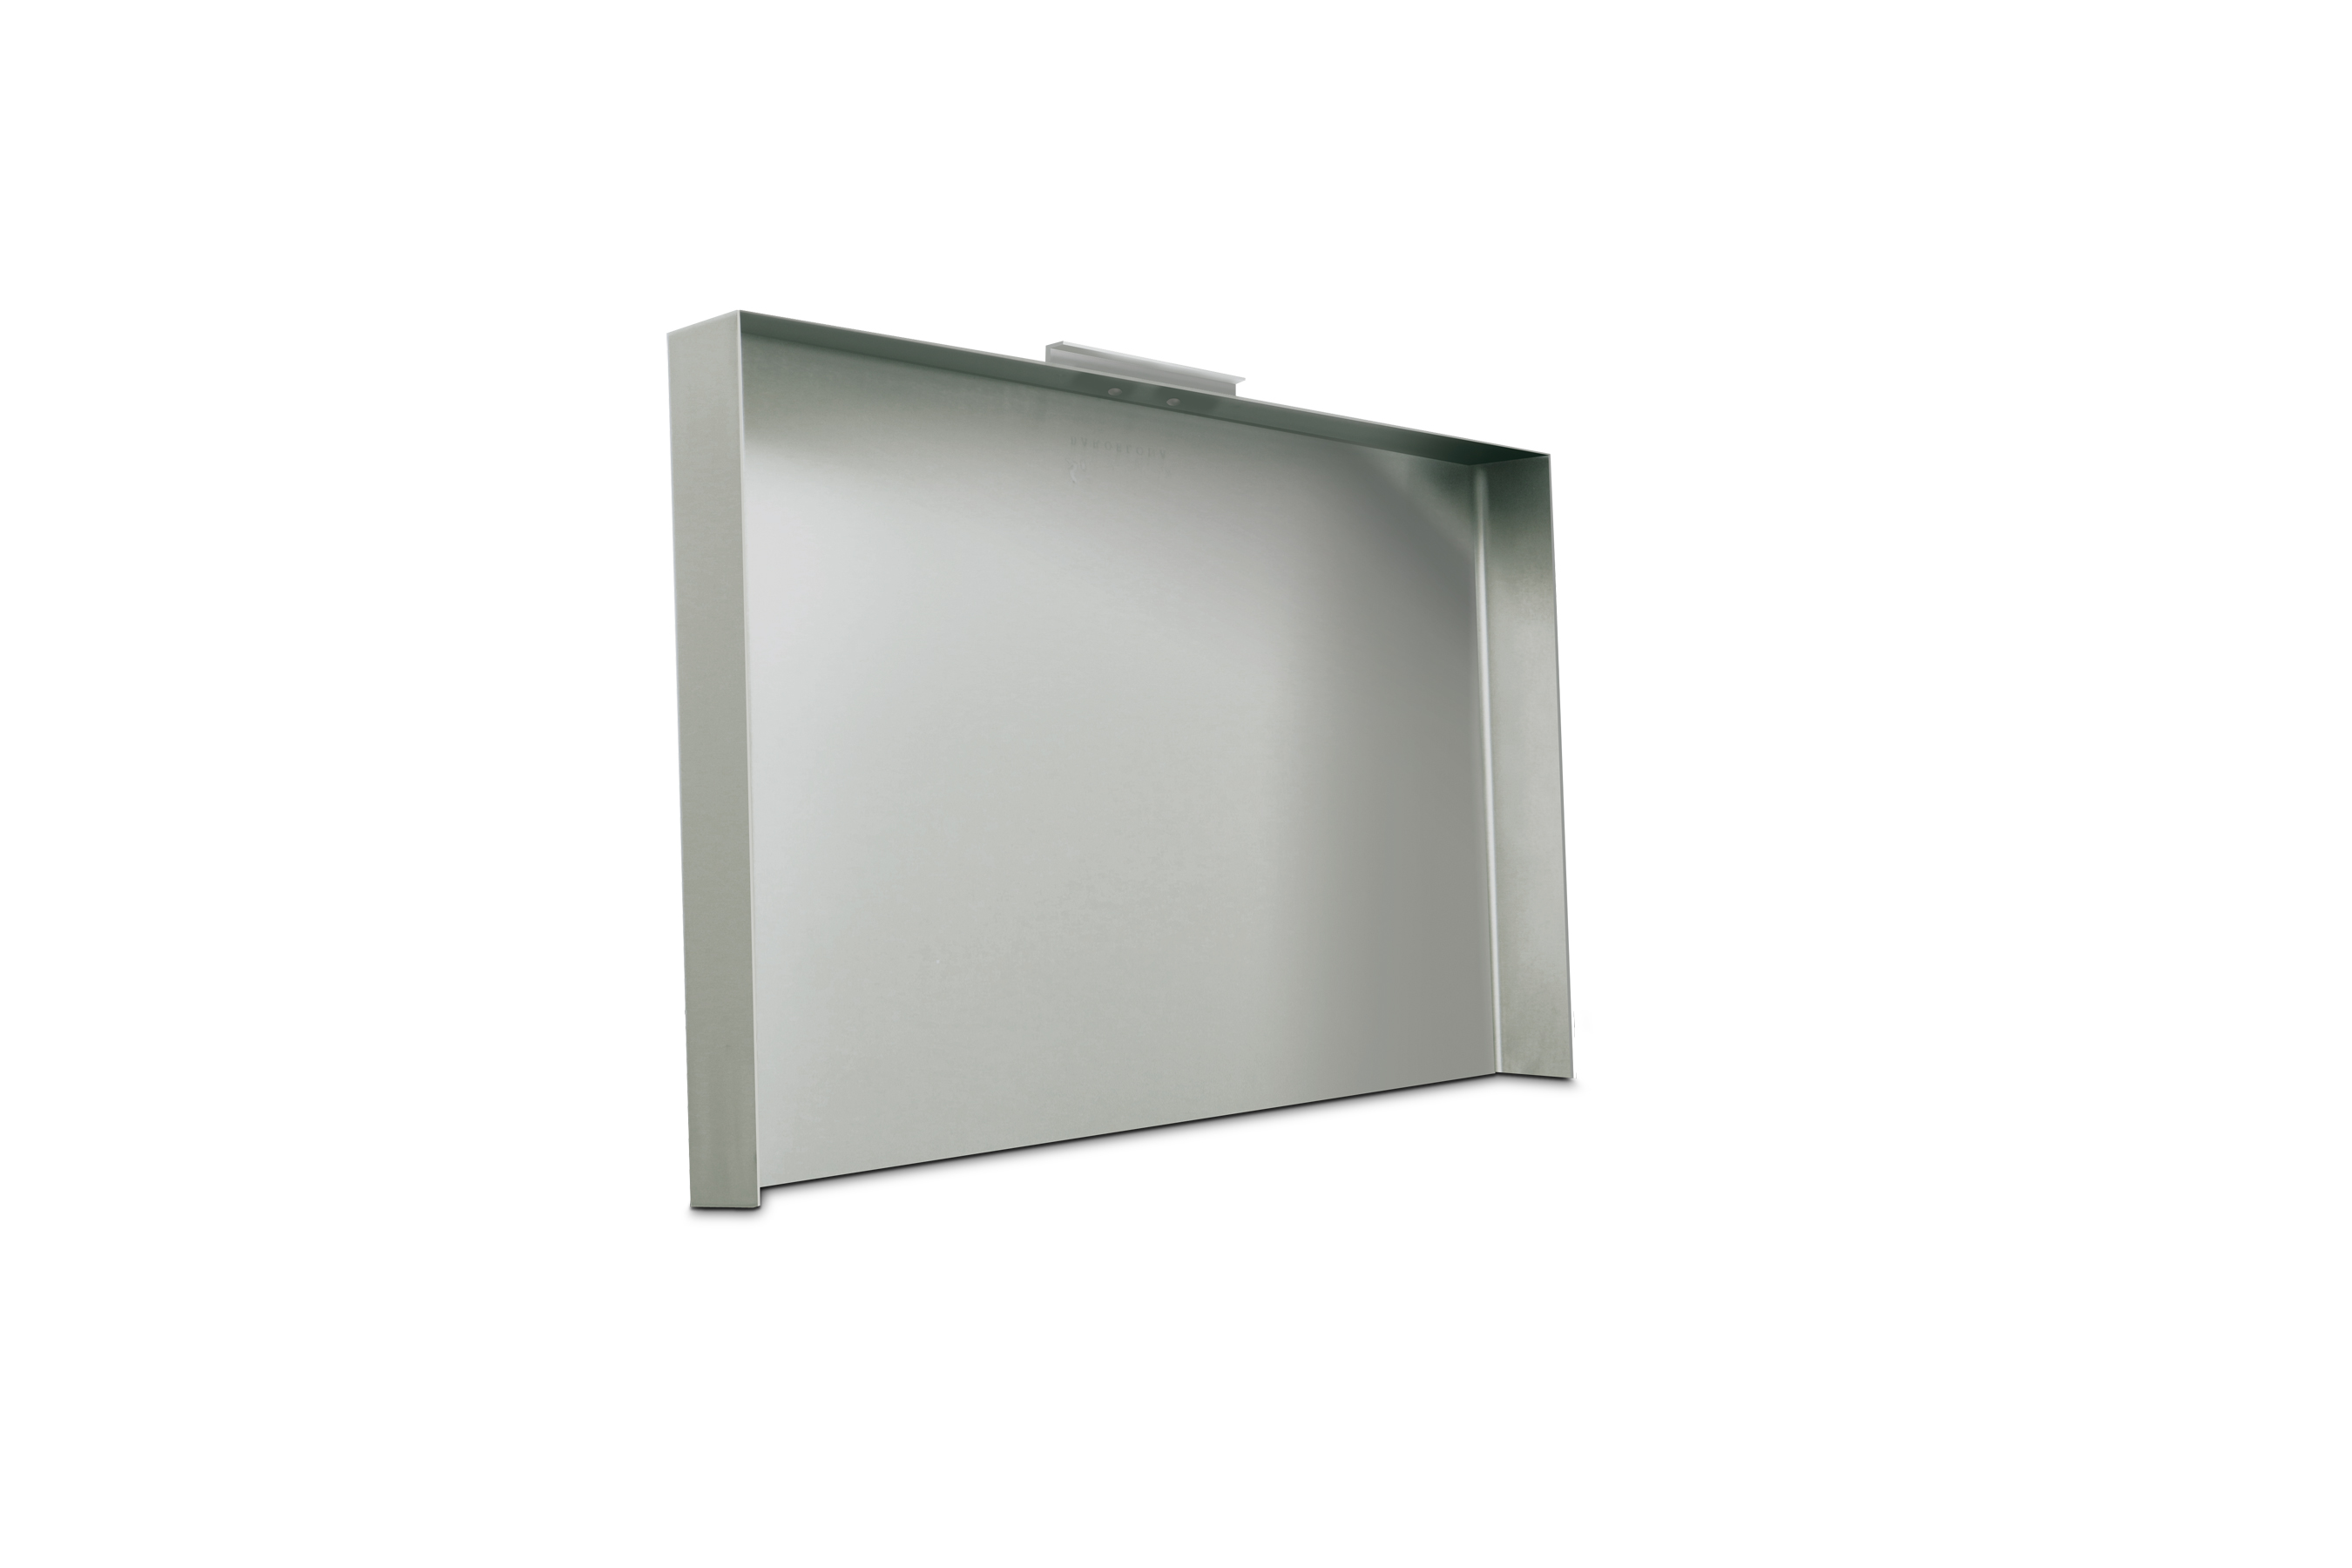 Simogas Deckel / Abdeckung Edelstahl CVSE-60 Plancha Silver/Extrem Bild 1